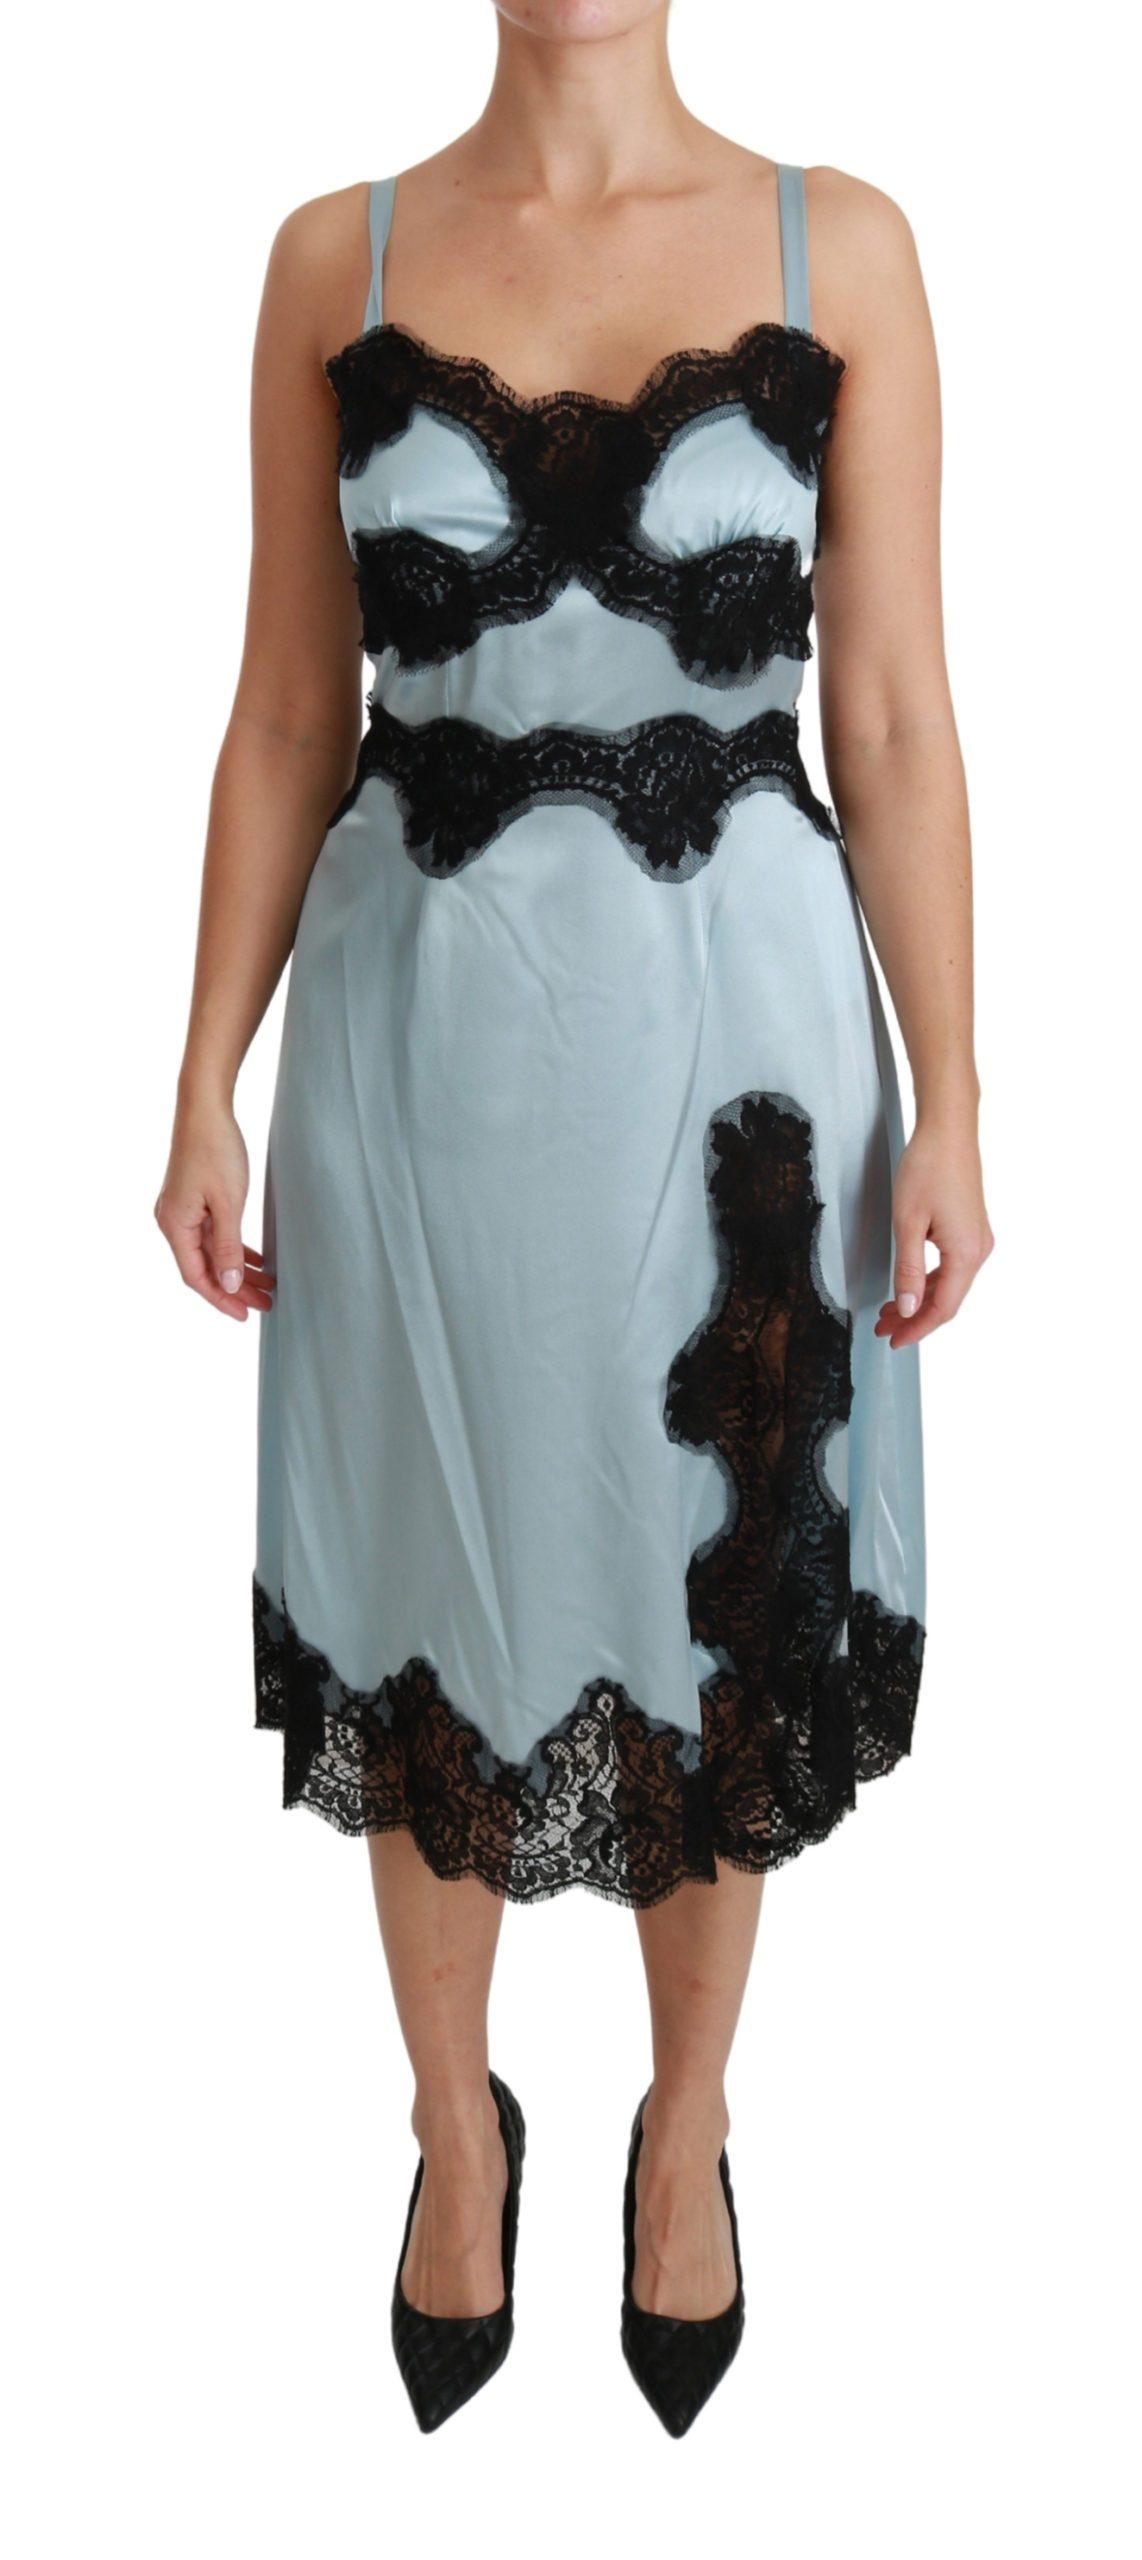 Dolce & Gabbana Women's Silk Lingerie Slip Lace Midi Dress Blue DR2490 - IT42|M